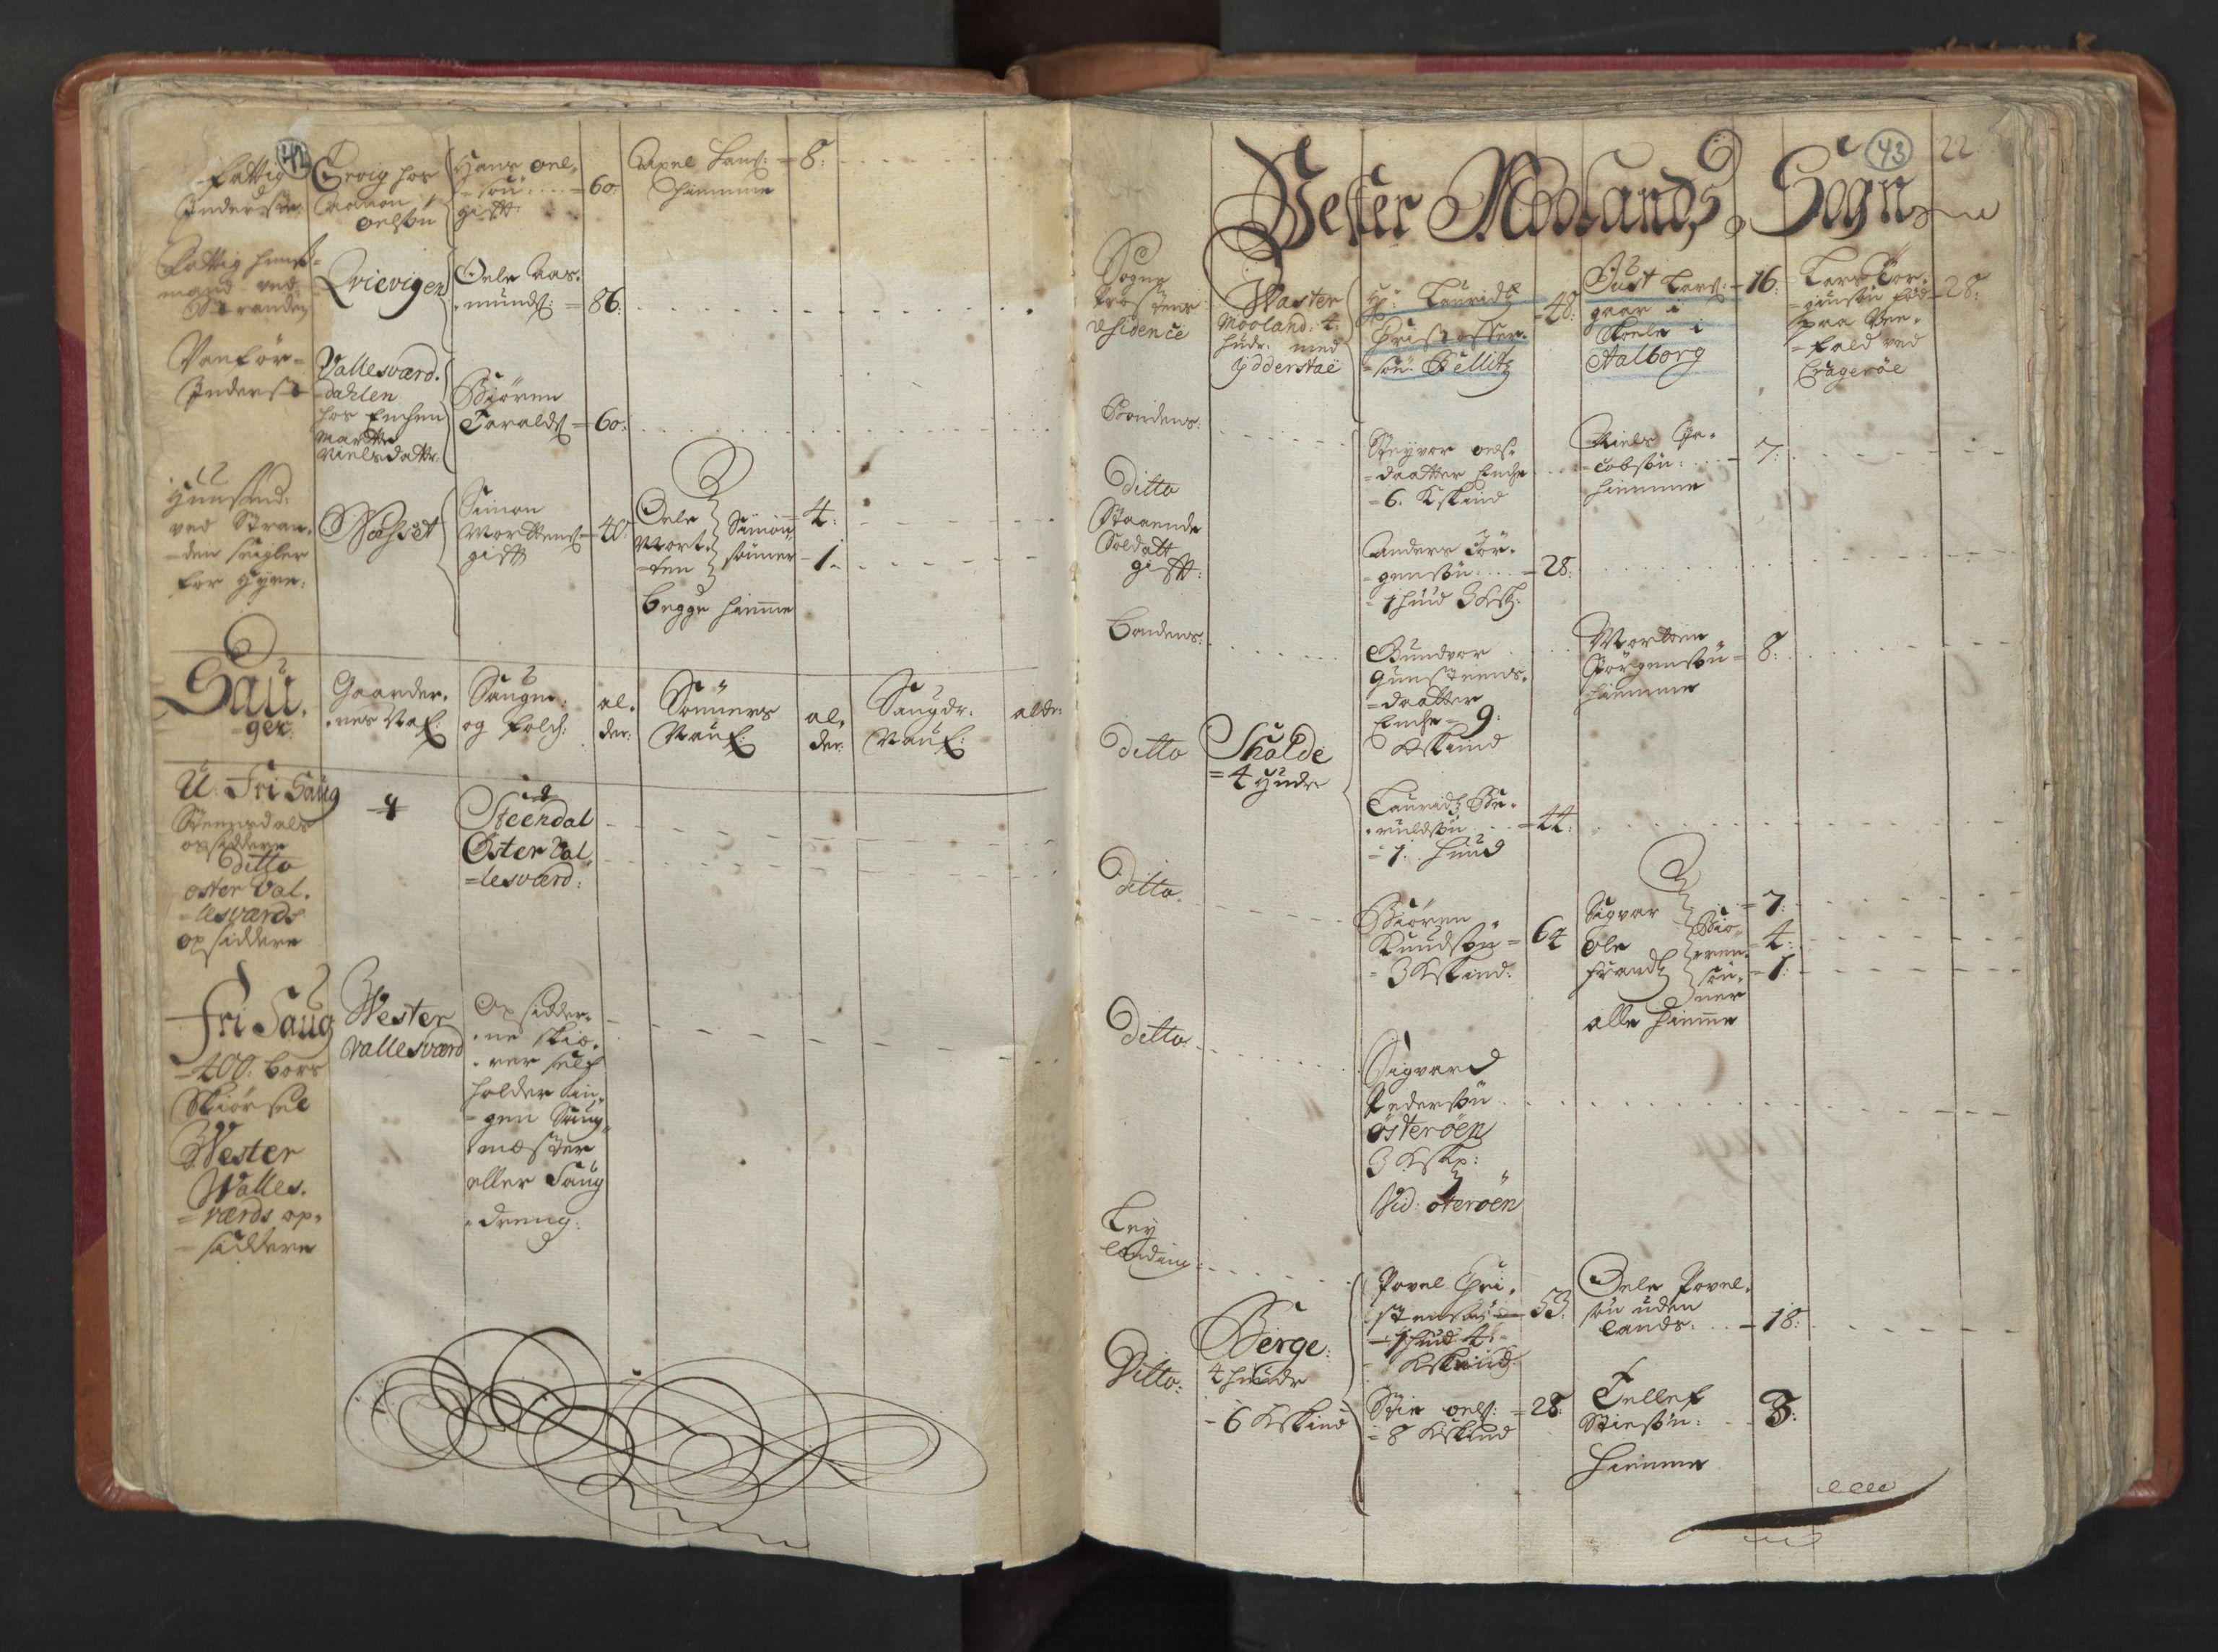 RA, Manntallet 1701, nr. 3: Nedenes fogderi, 1701, s. 42-43